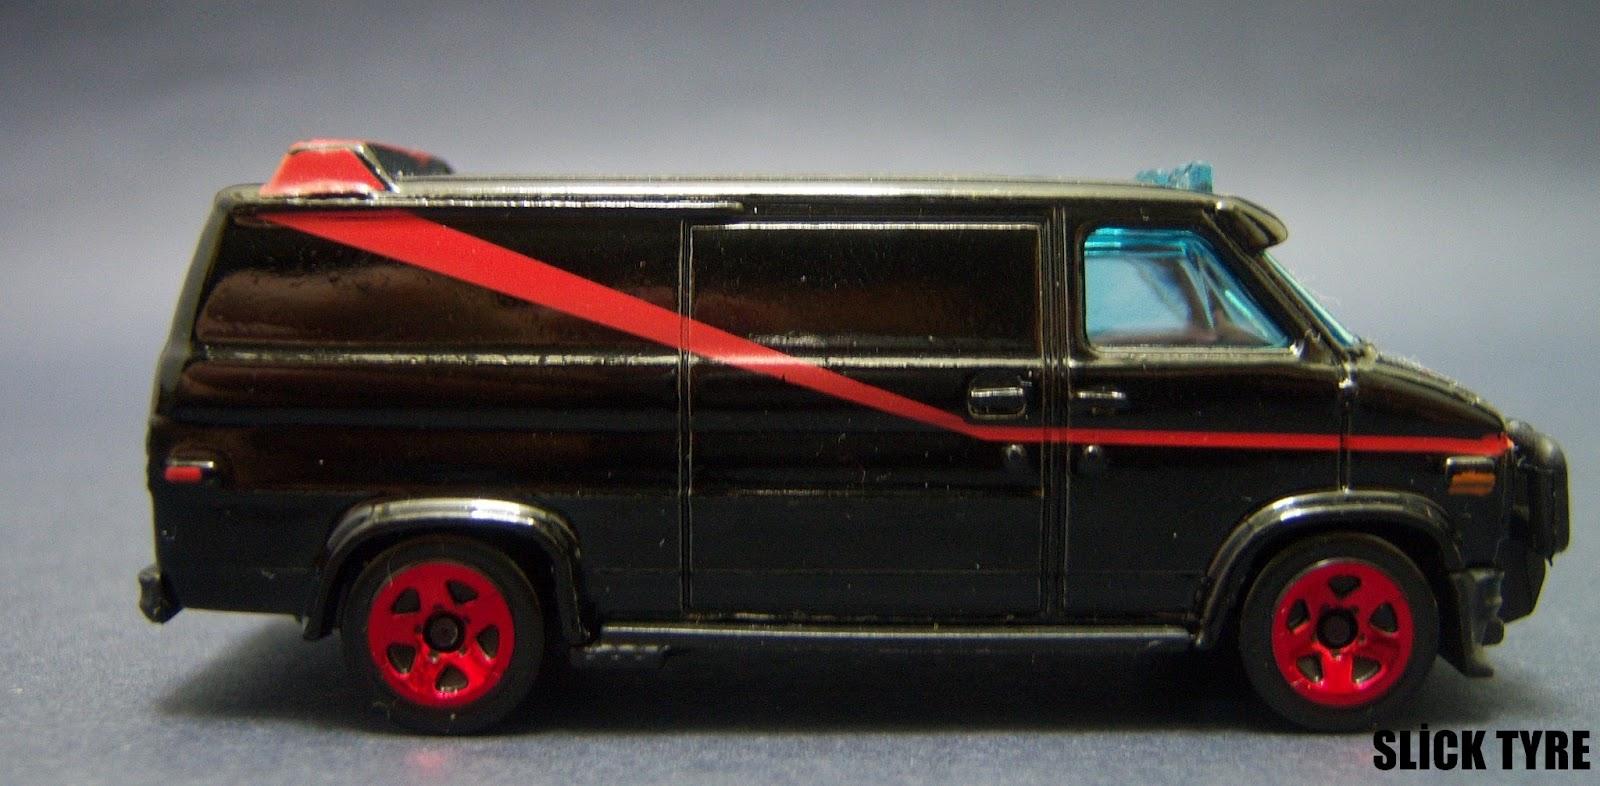 slick tyre diecast car collection hotwheels a team car. Black Bedroom Furniture Sets. Home Design Ideas